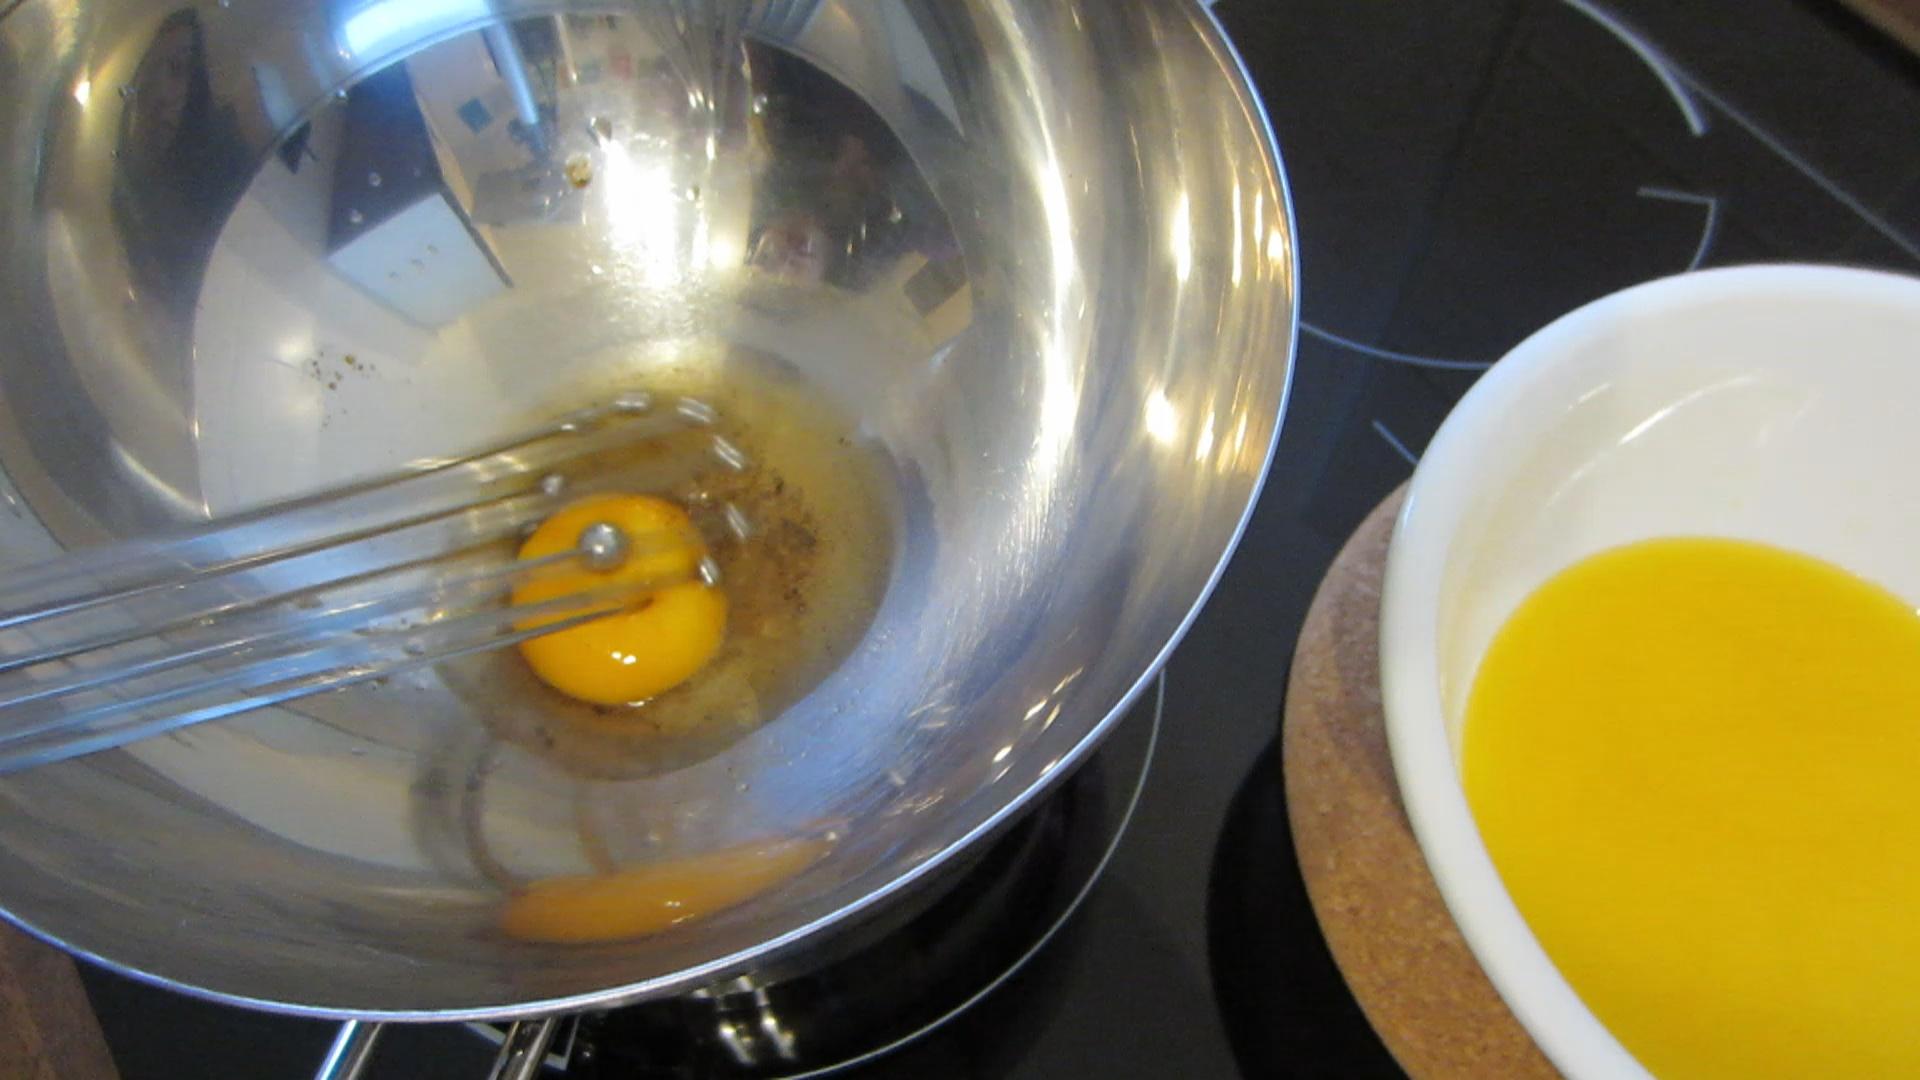 2014-04-25-Grüner-Spargel-mit-homemade-Sauce-hollandaise-10.jpg